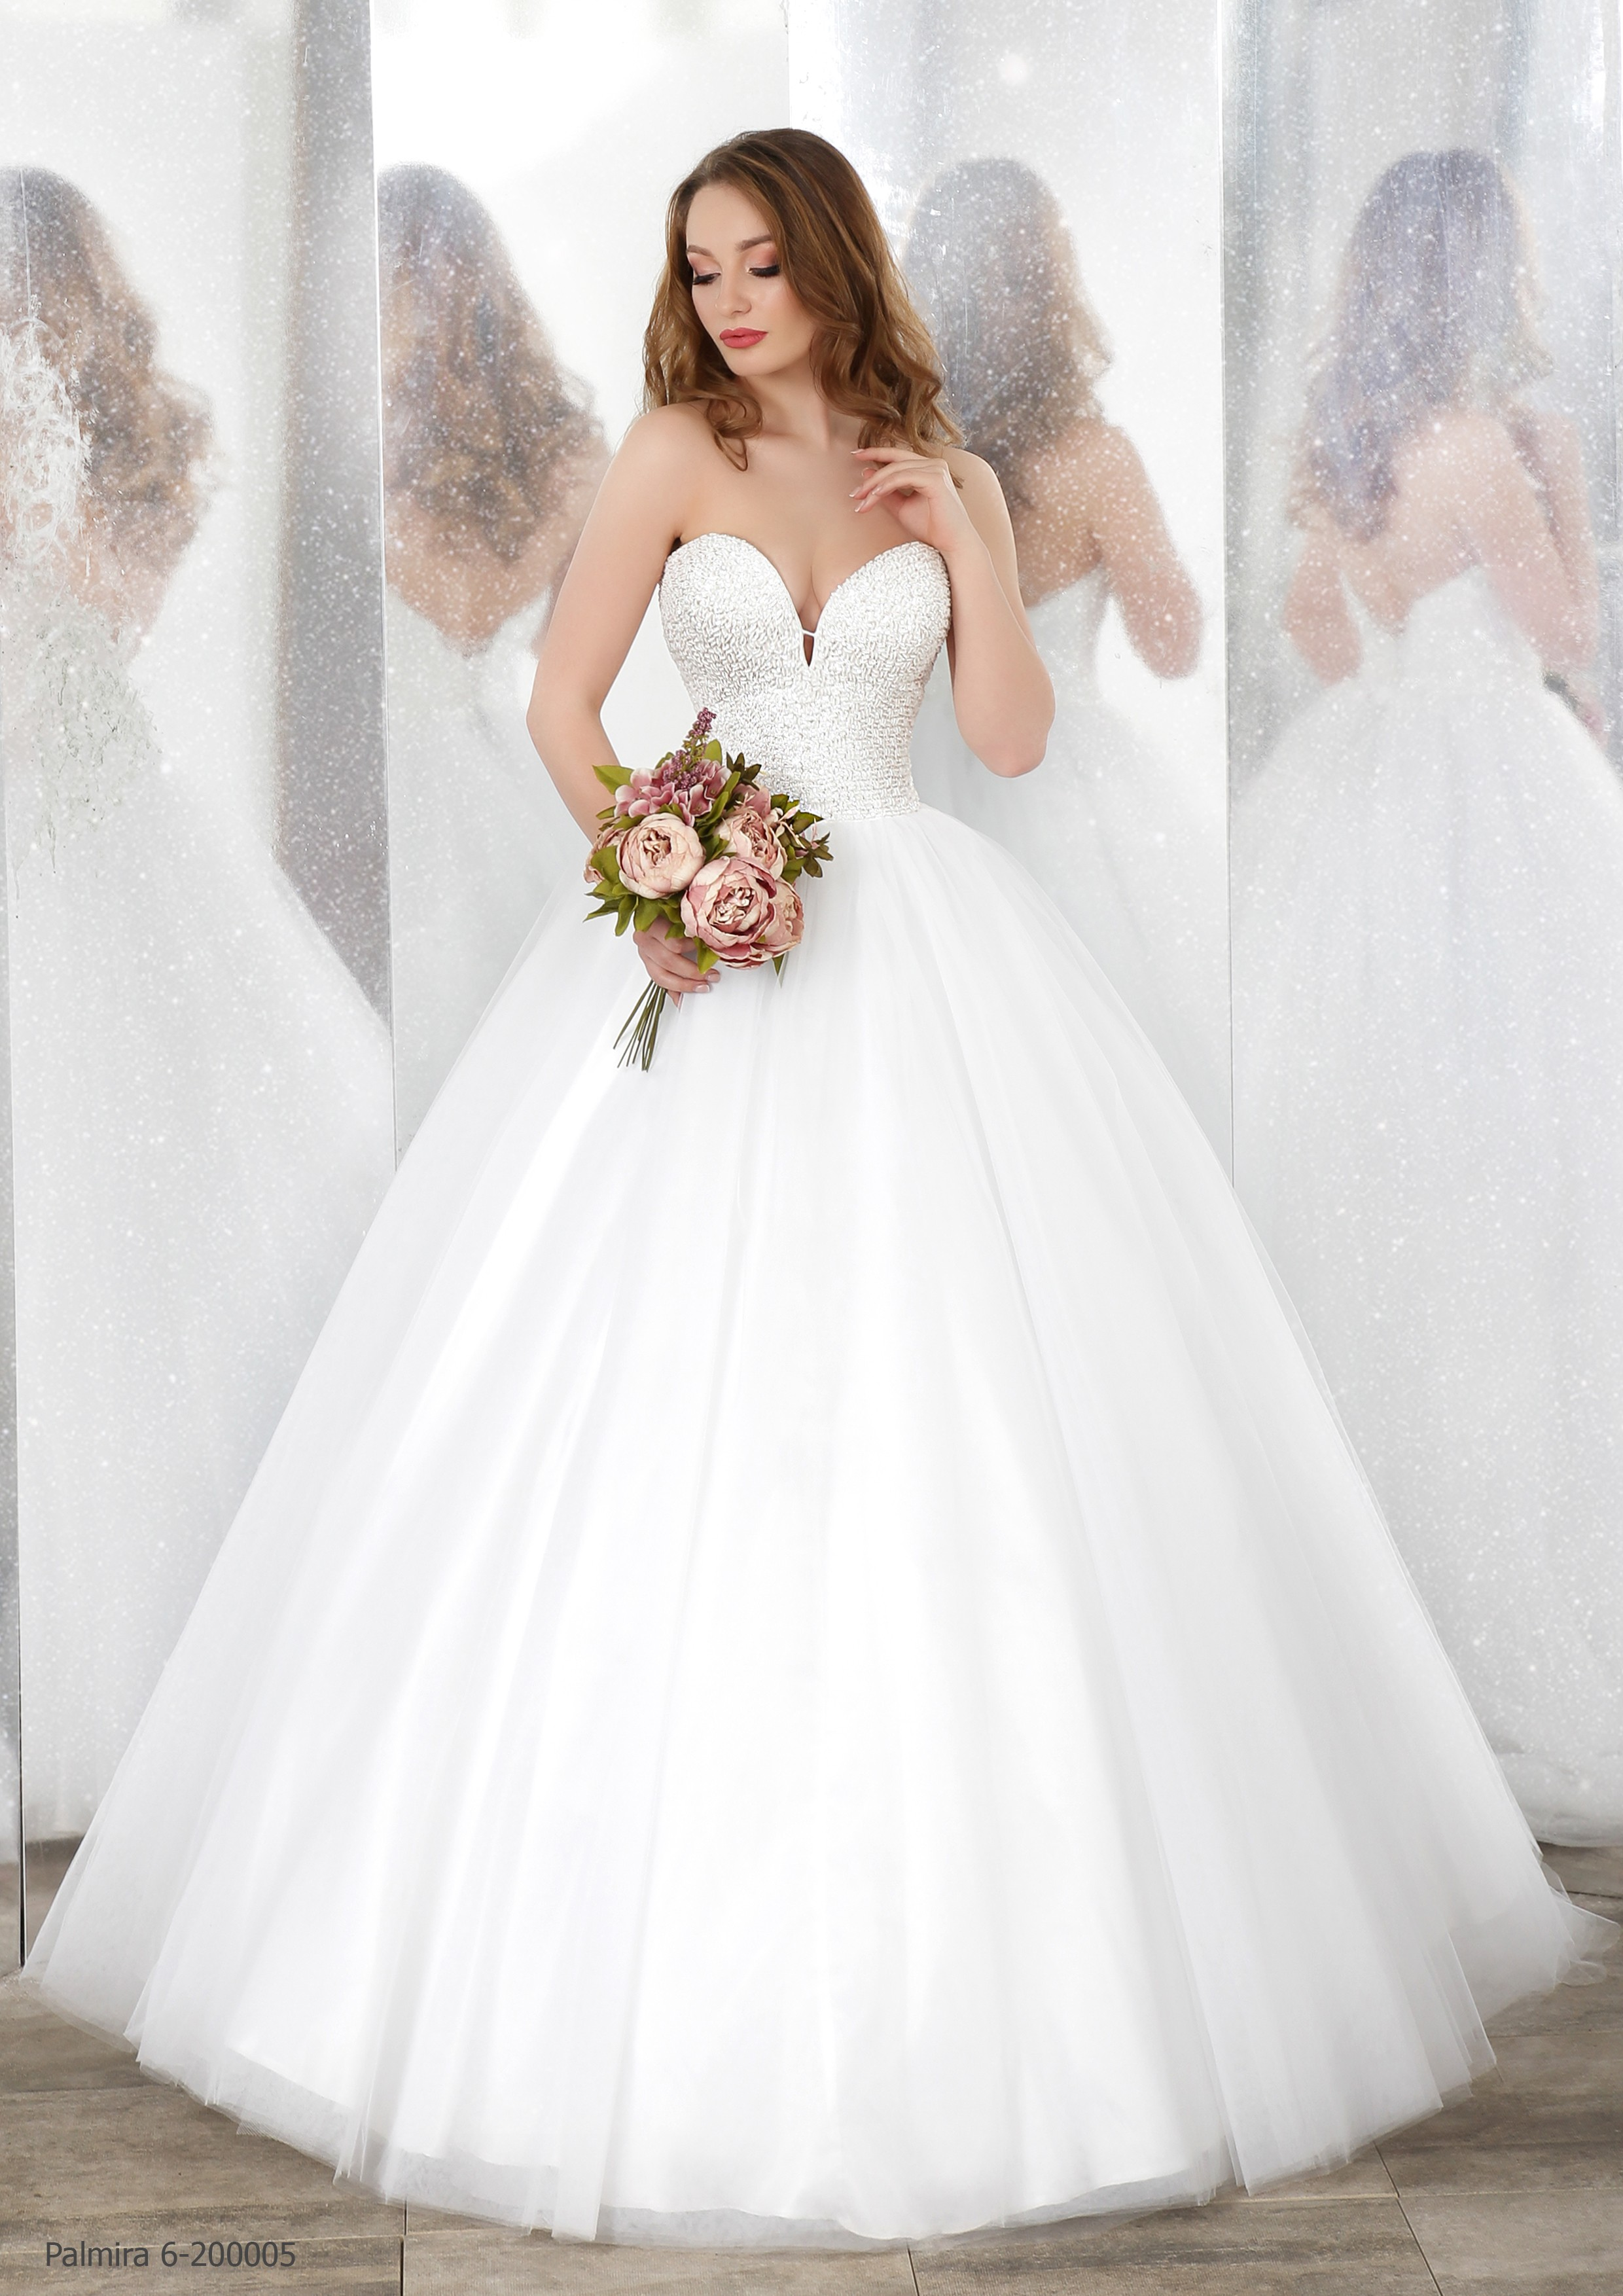 sale retailer f96b2 0fc21 Abito da sposa principesco Mod. Amelia